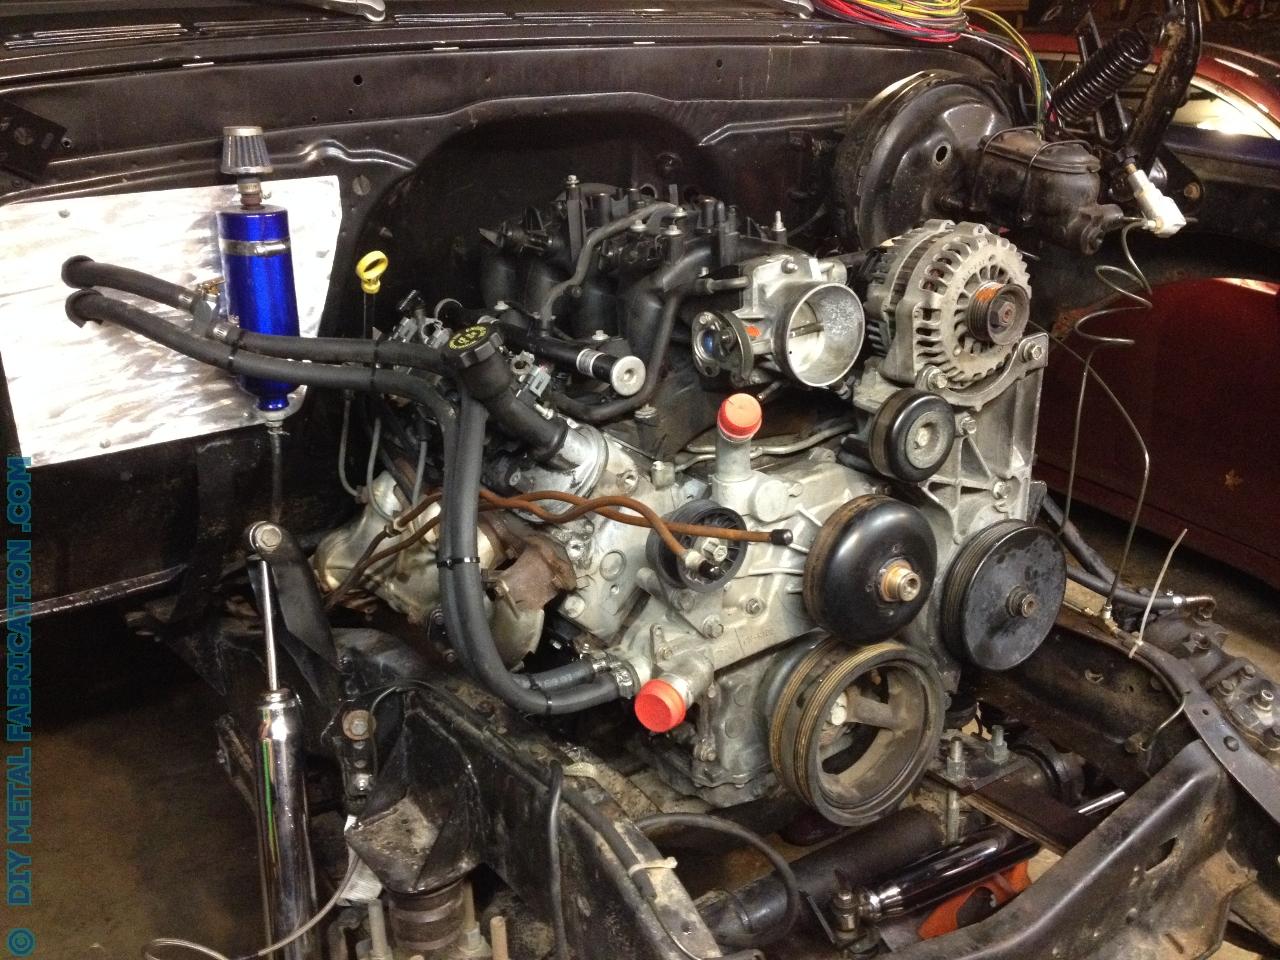 Truck 71 chevy truck parts : 5.3 LS Engine Swap into Ol' Blue 1971 Chevy Truck Part 4 – DIY ...